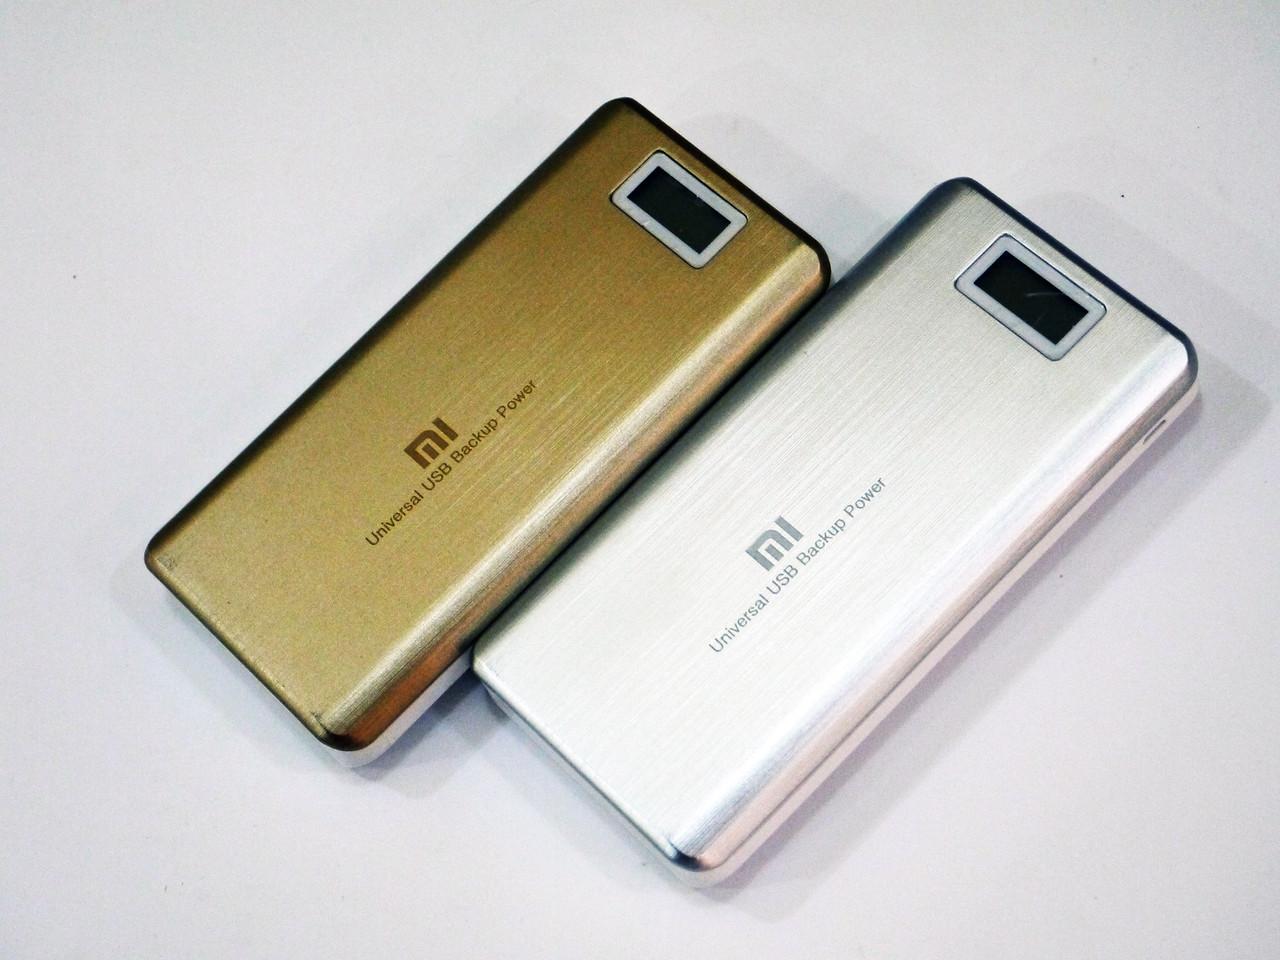 Power Bank Xiaomi Mi 20800 mAh Метал. корпус